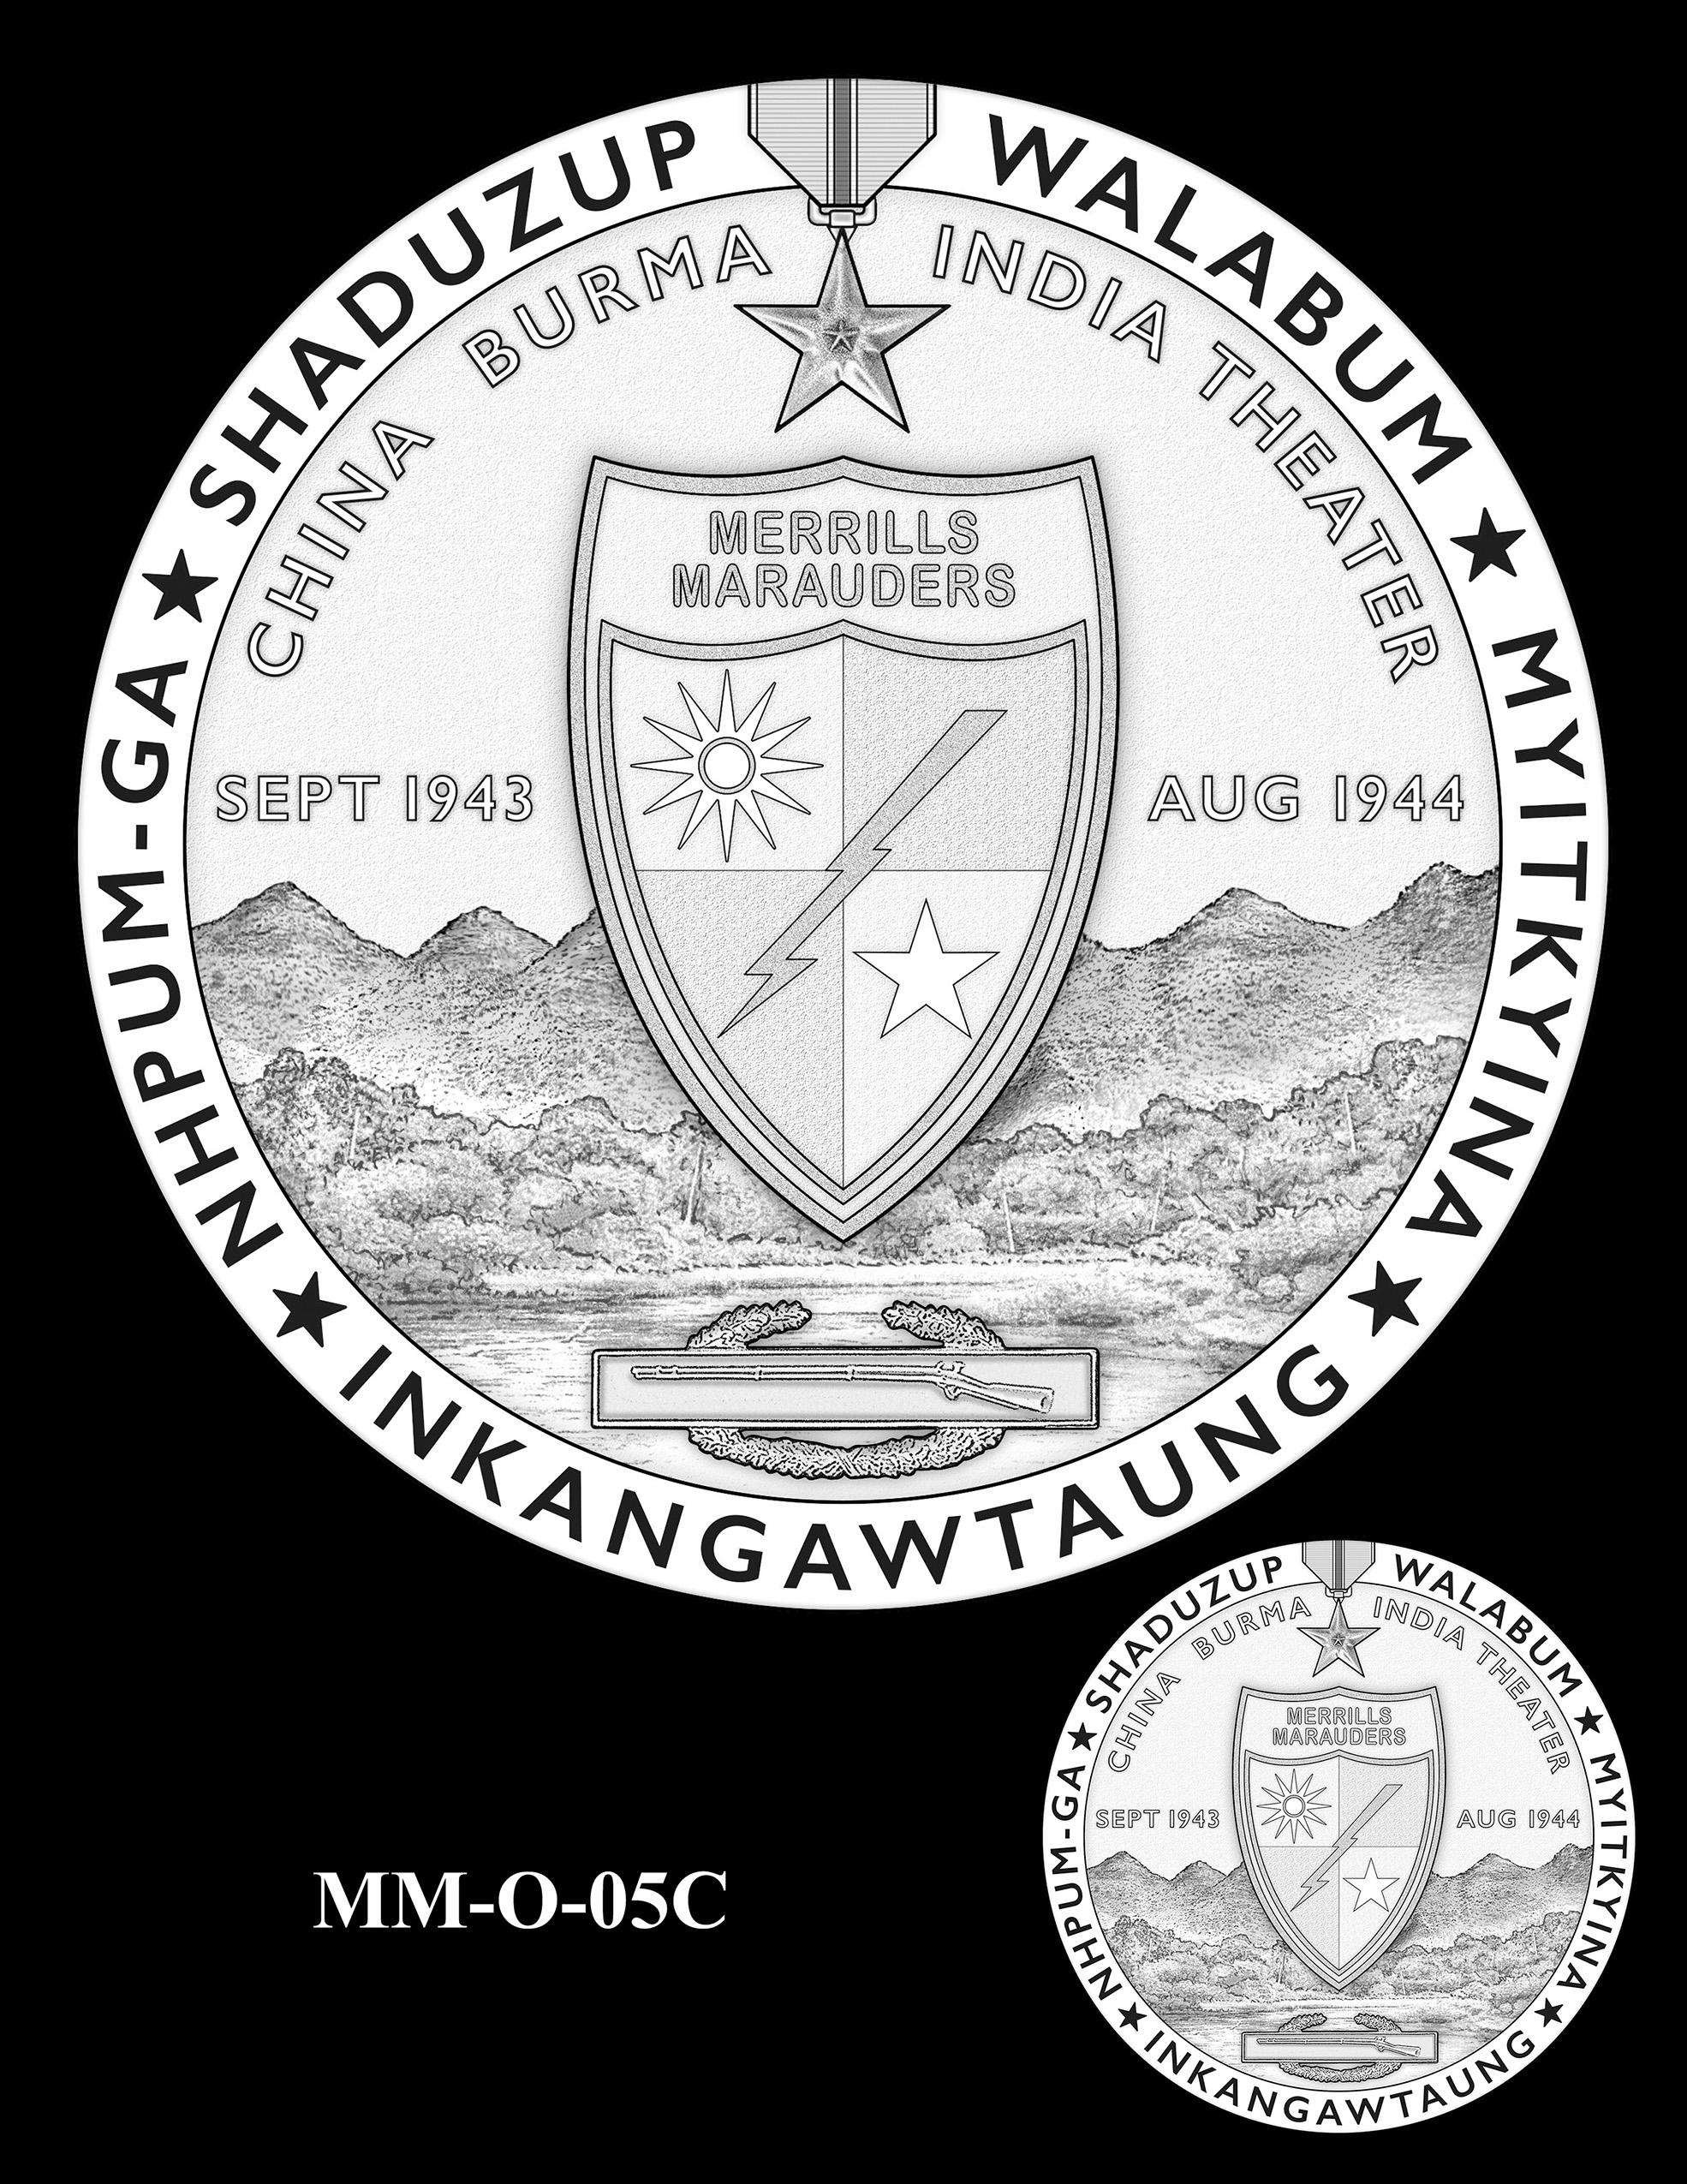 MM-O-05C -- Merrill's Marauders Congressional Gold Medal